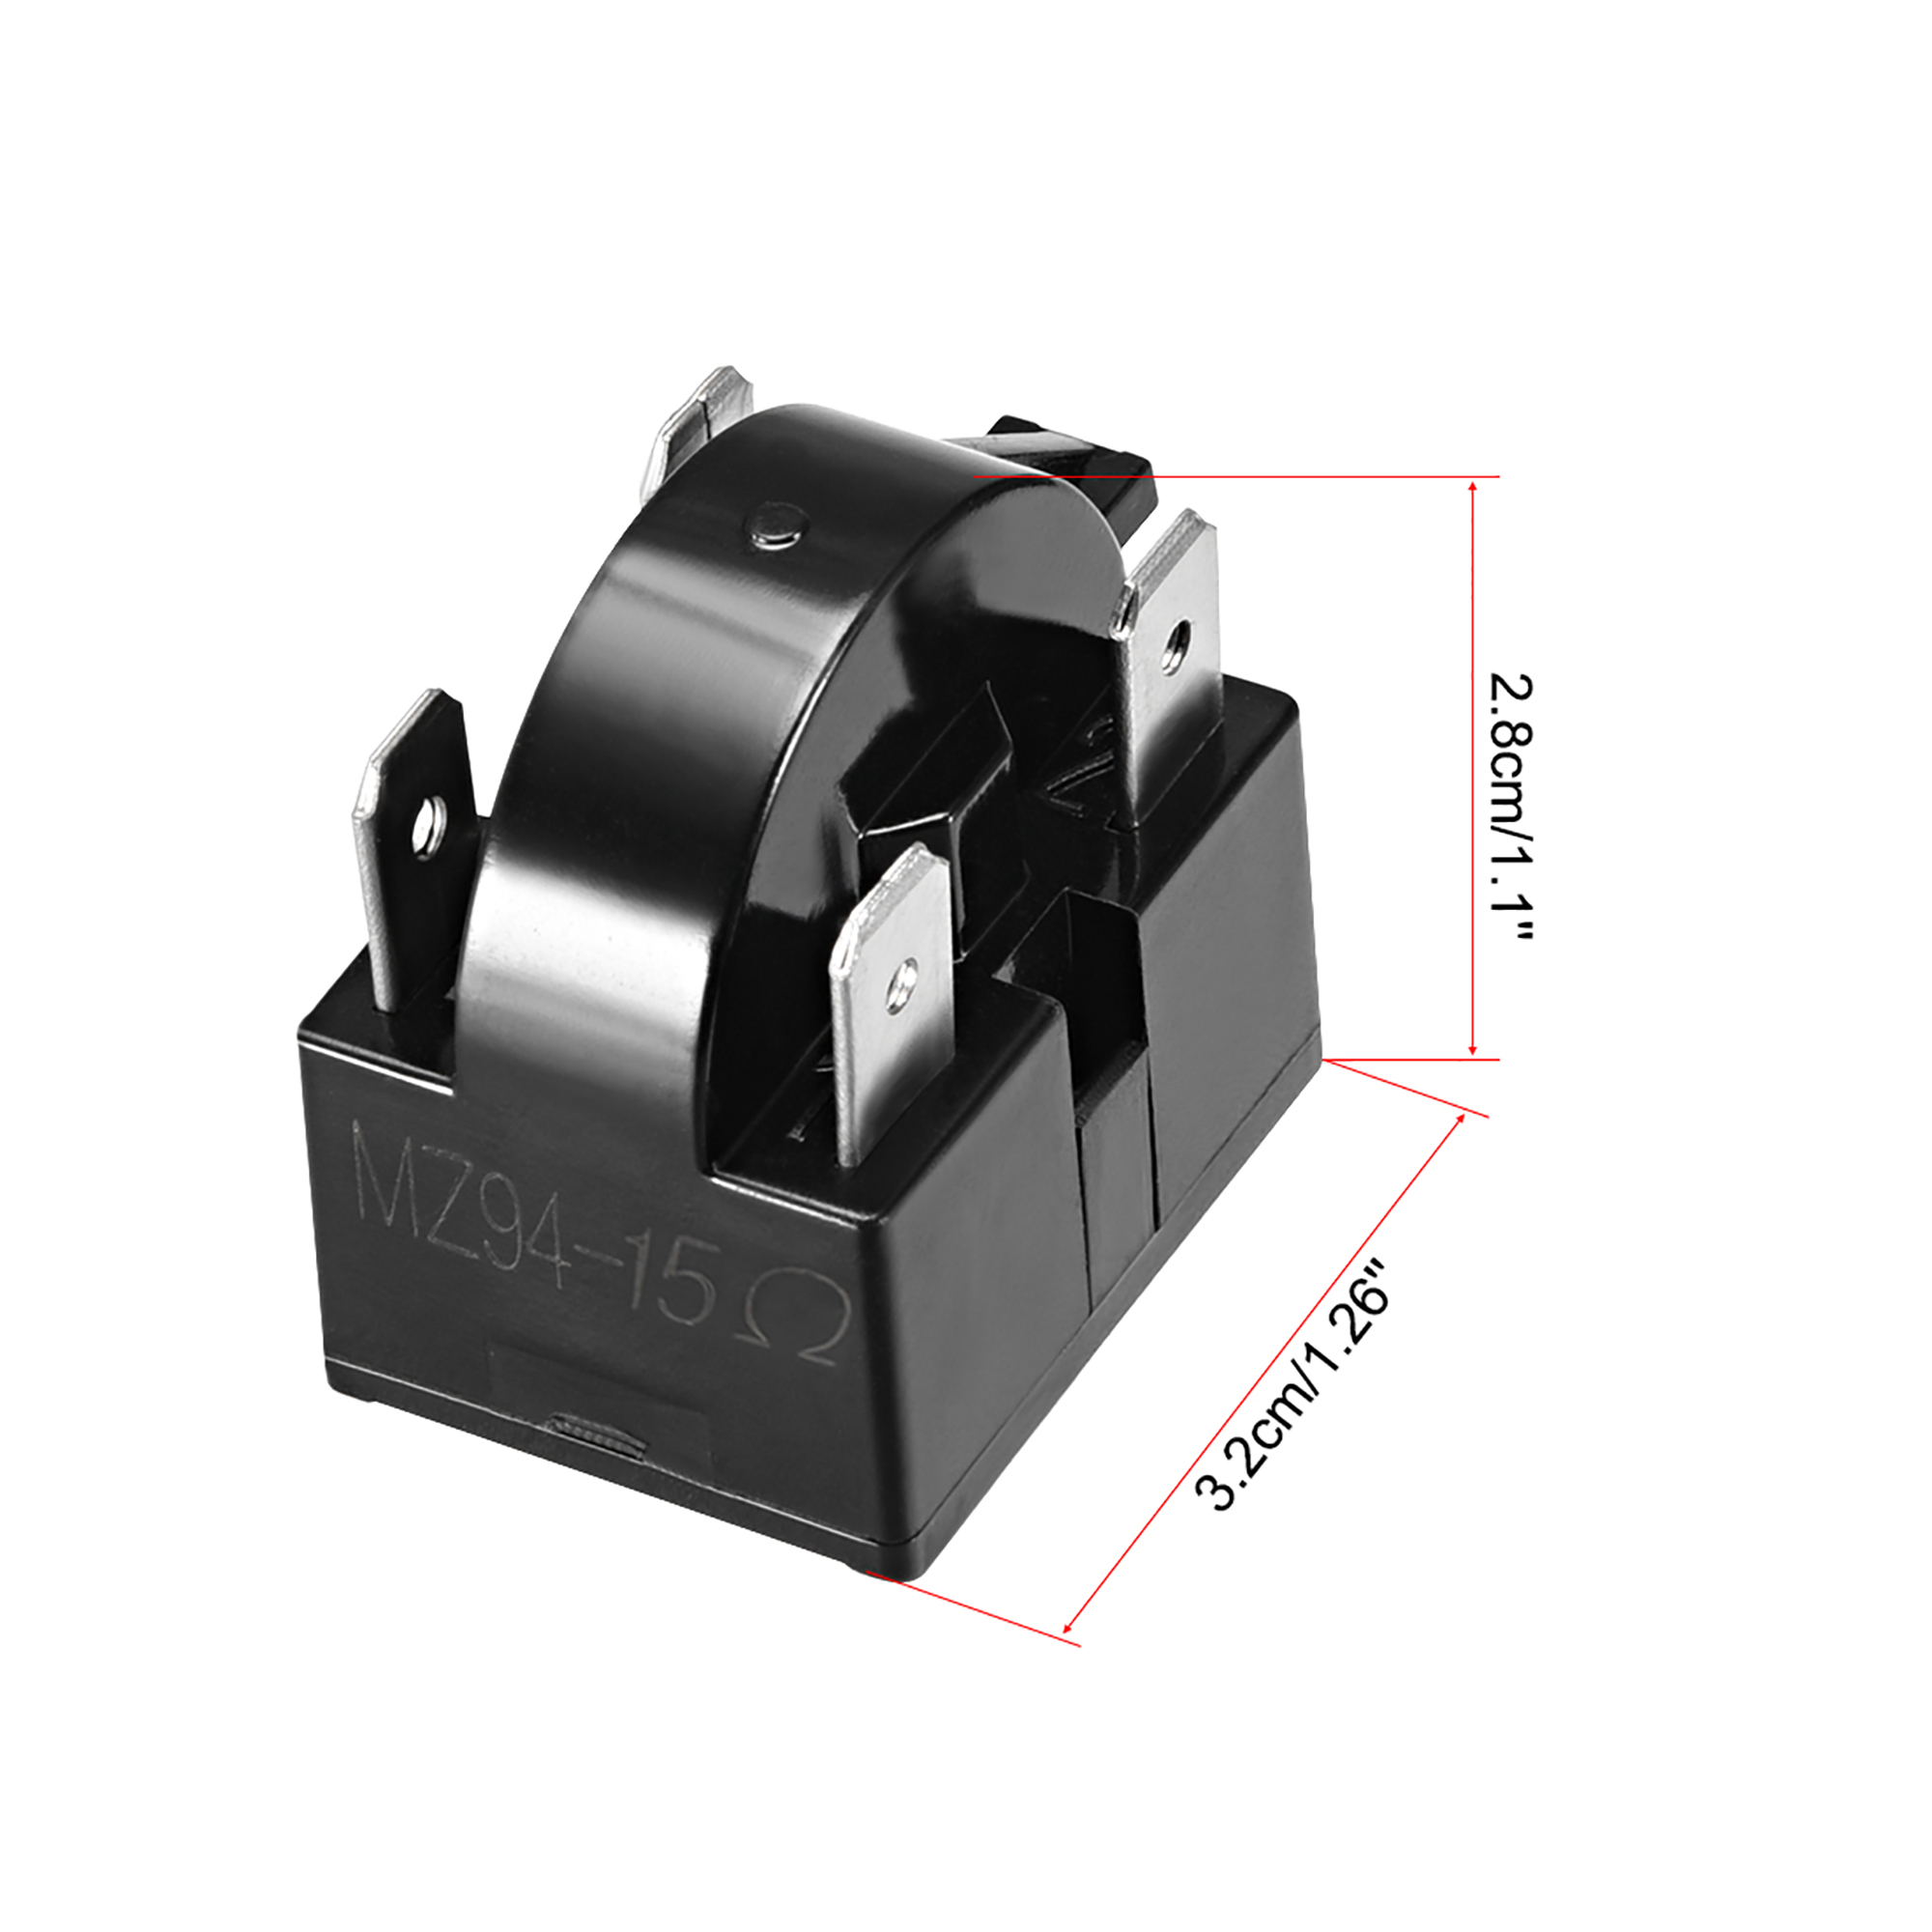 15 Ohm 4 Pin Refrigerator PTC Starter Relay Black - image 3 of 4